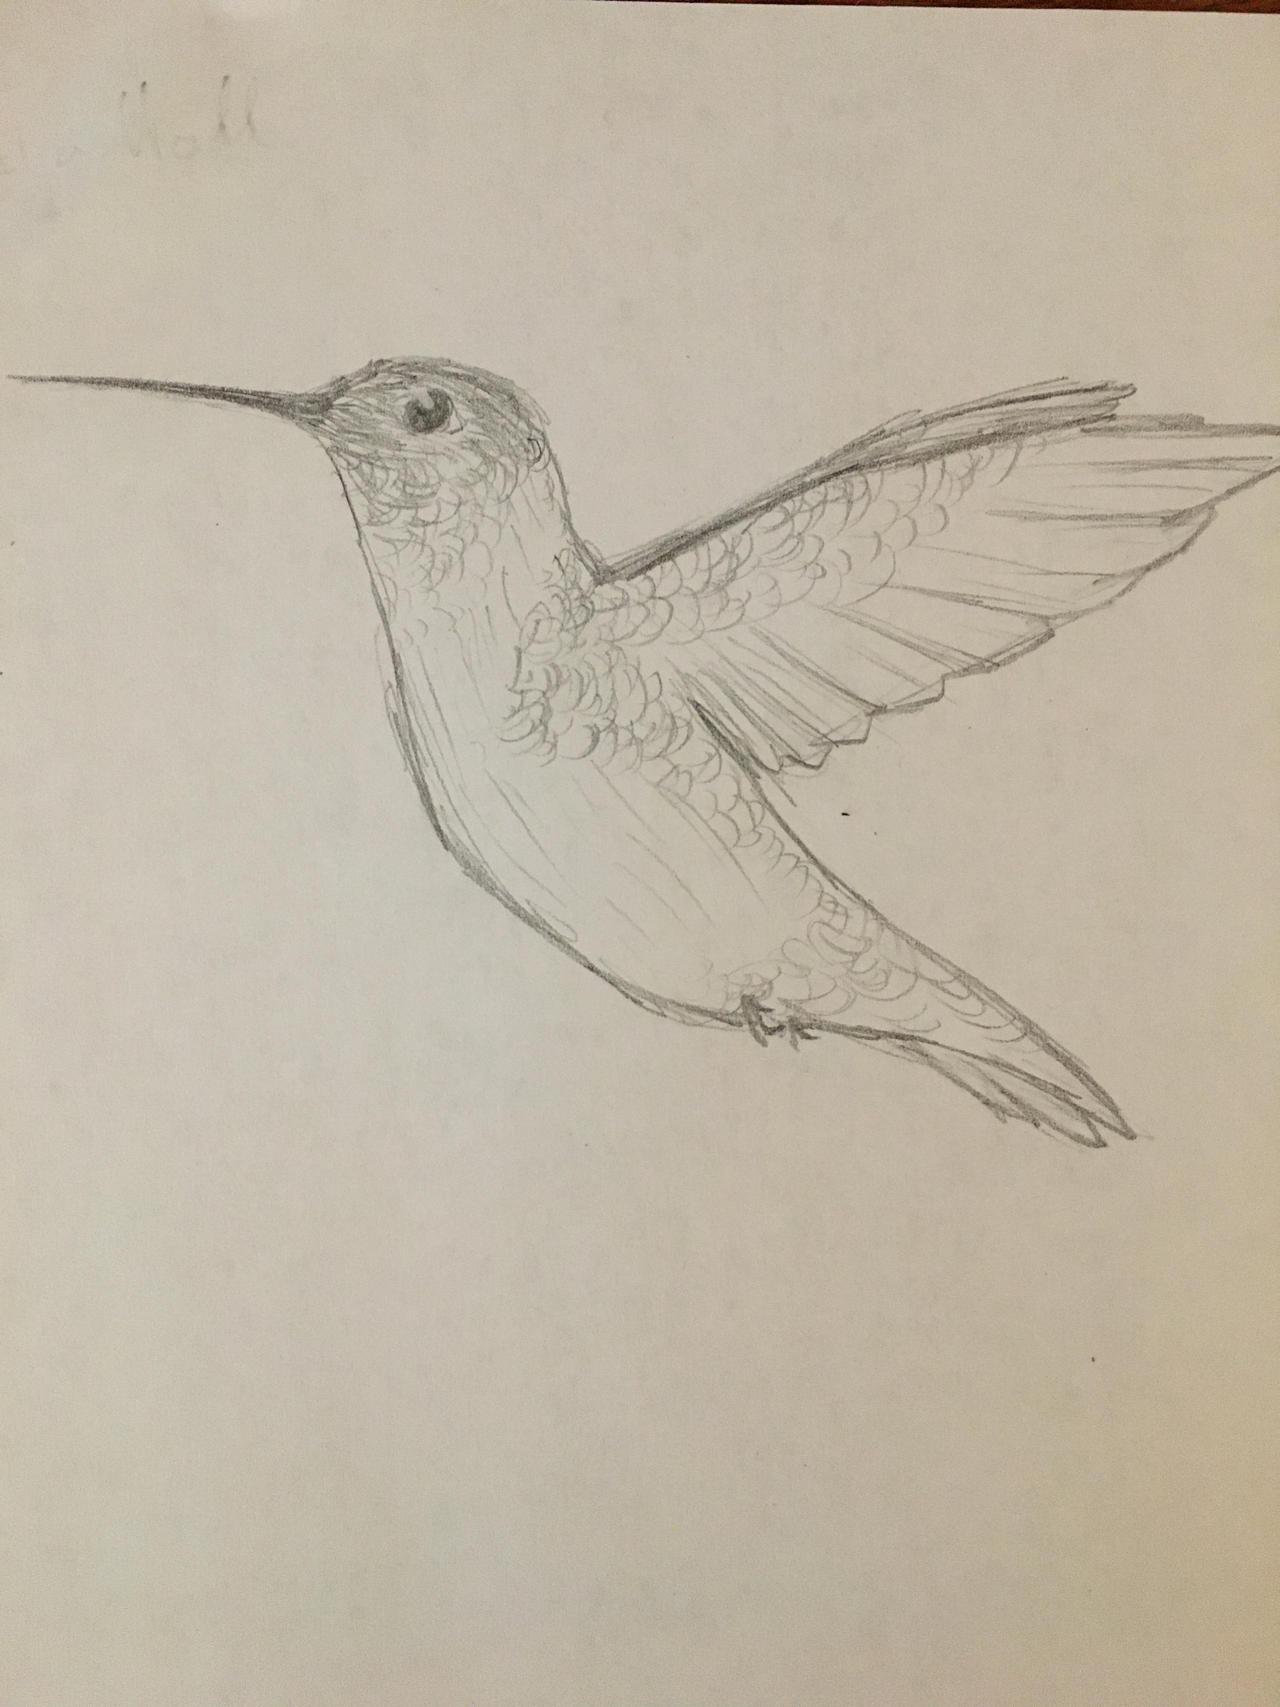 Day one hummingbird